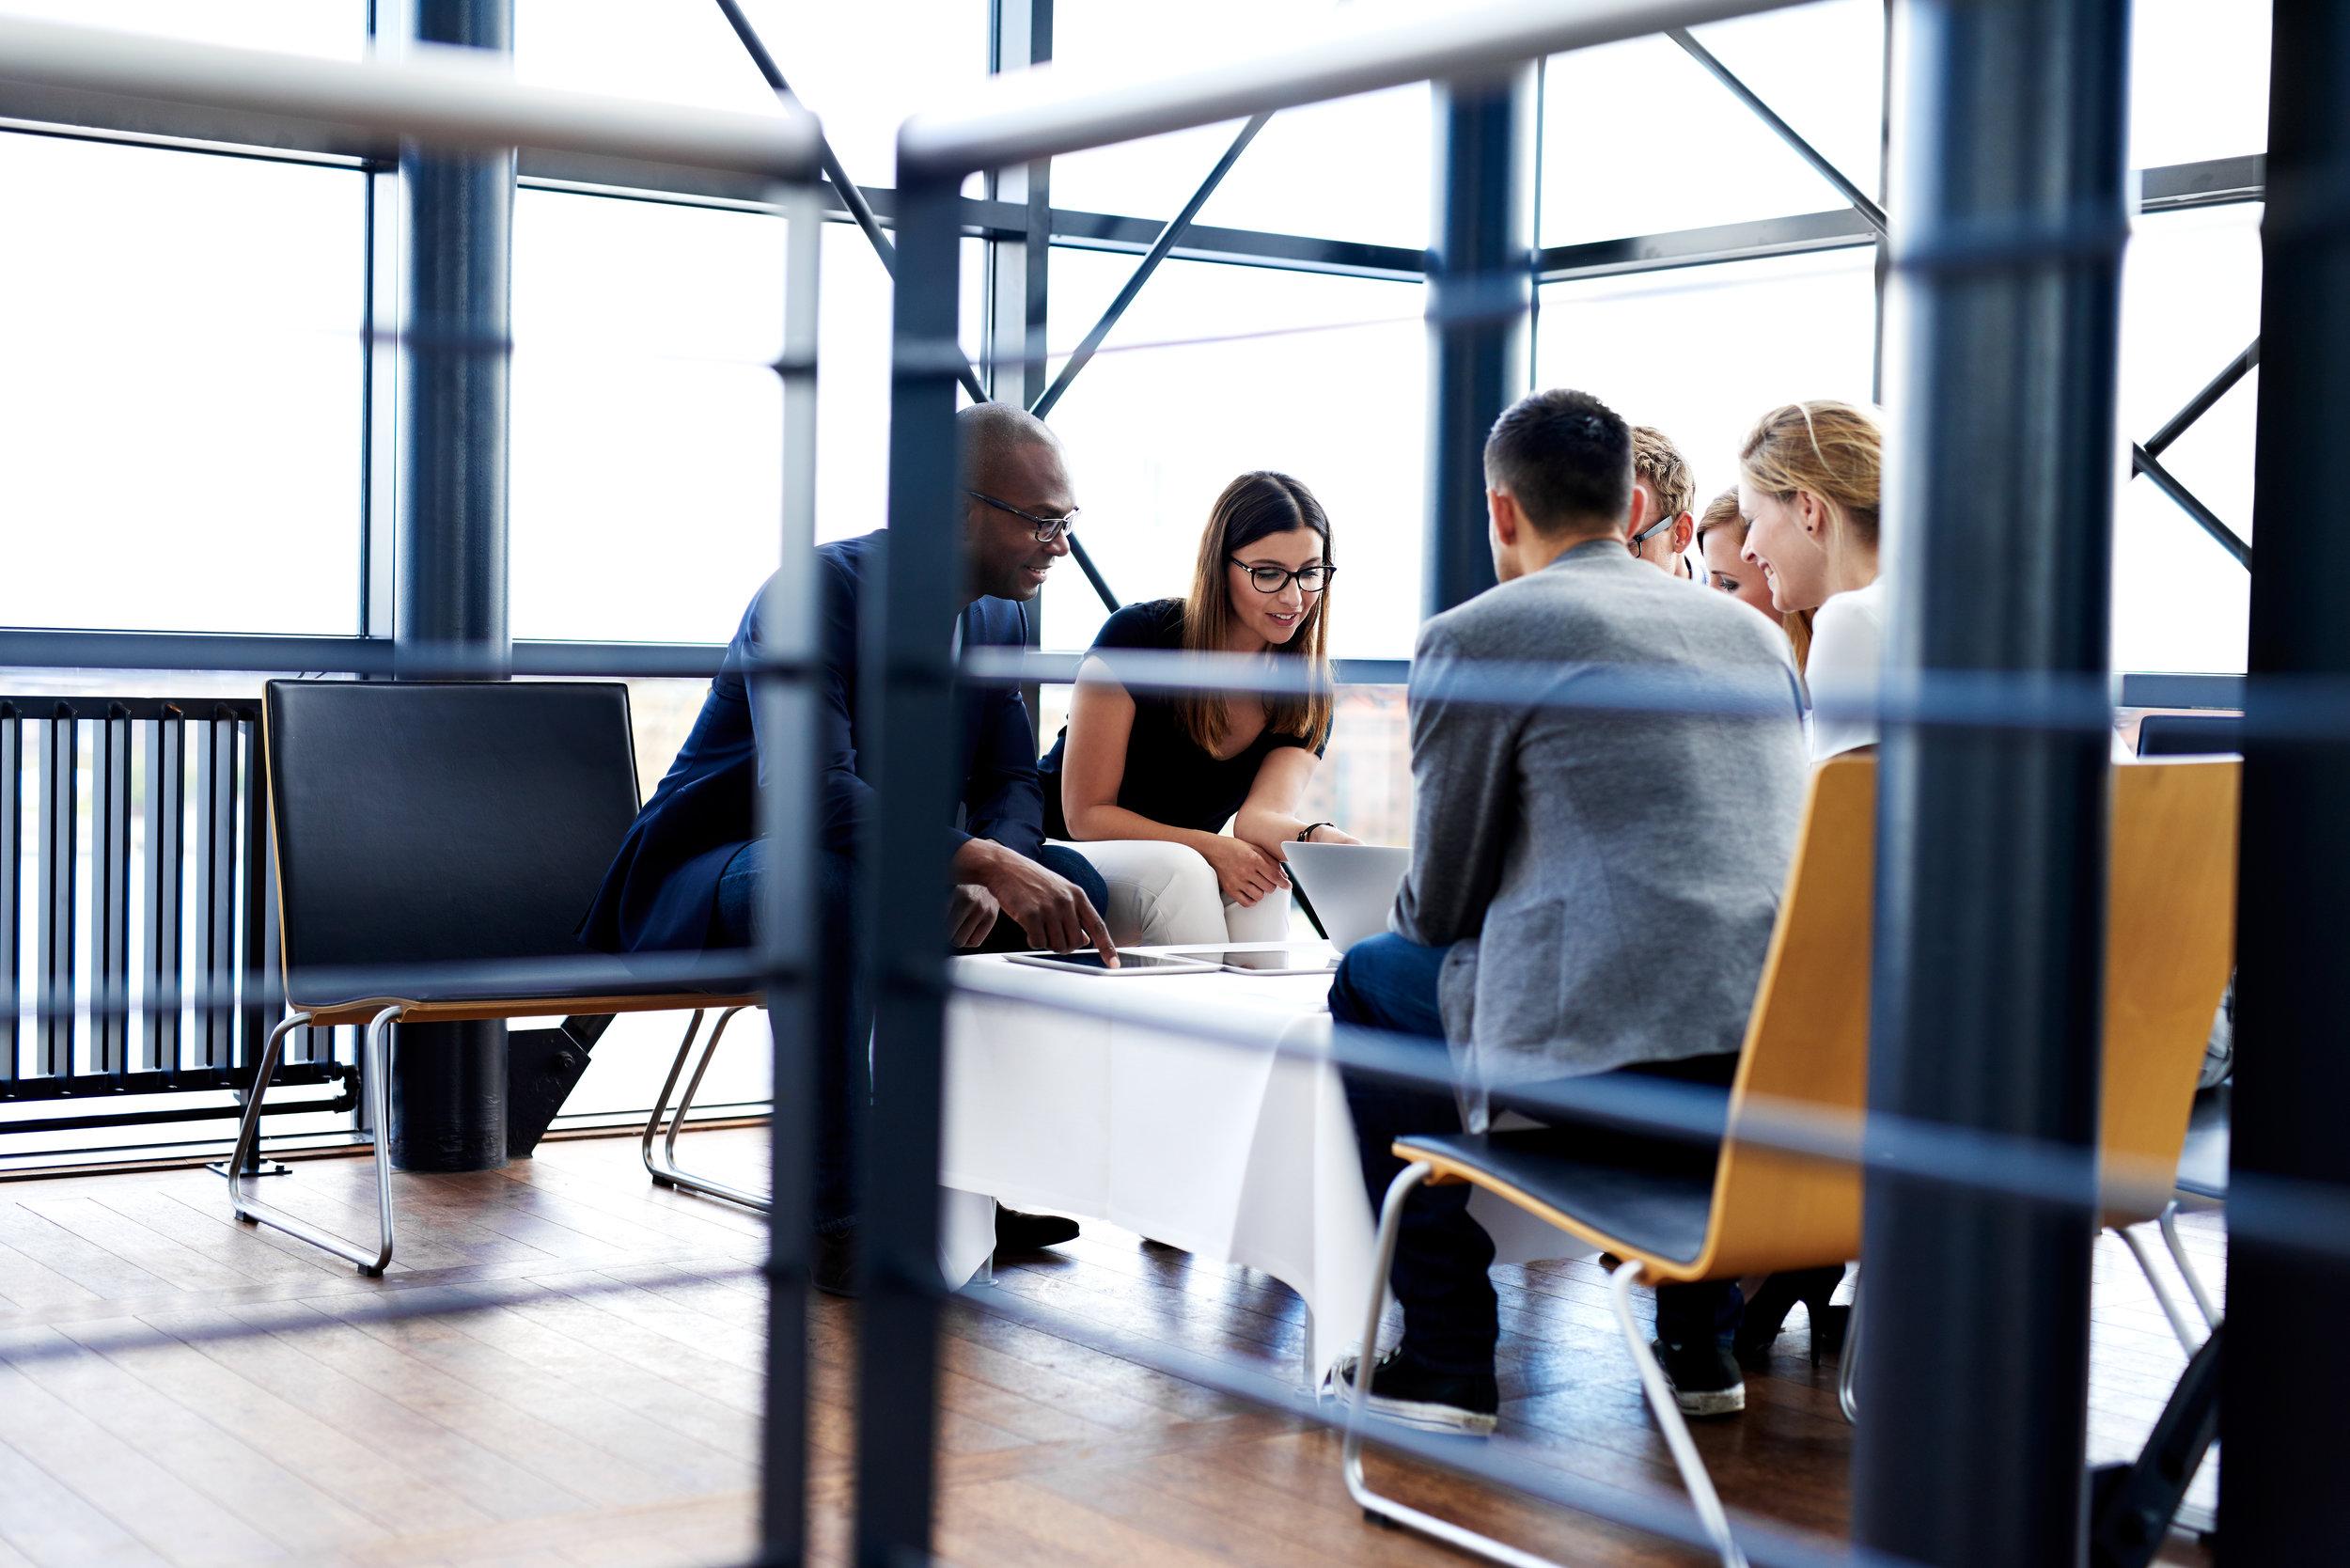 group-of-executives-sitting-together-and-working-PFNDYR7.jpg (6000×4004).jpg